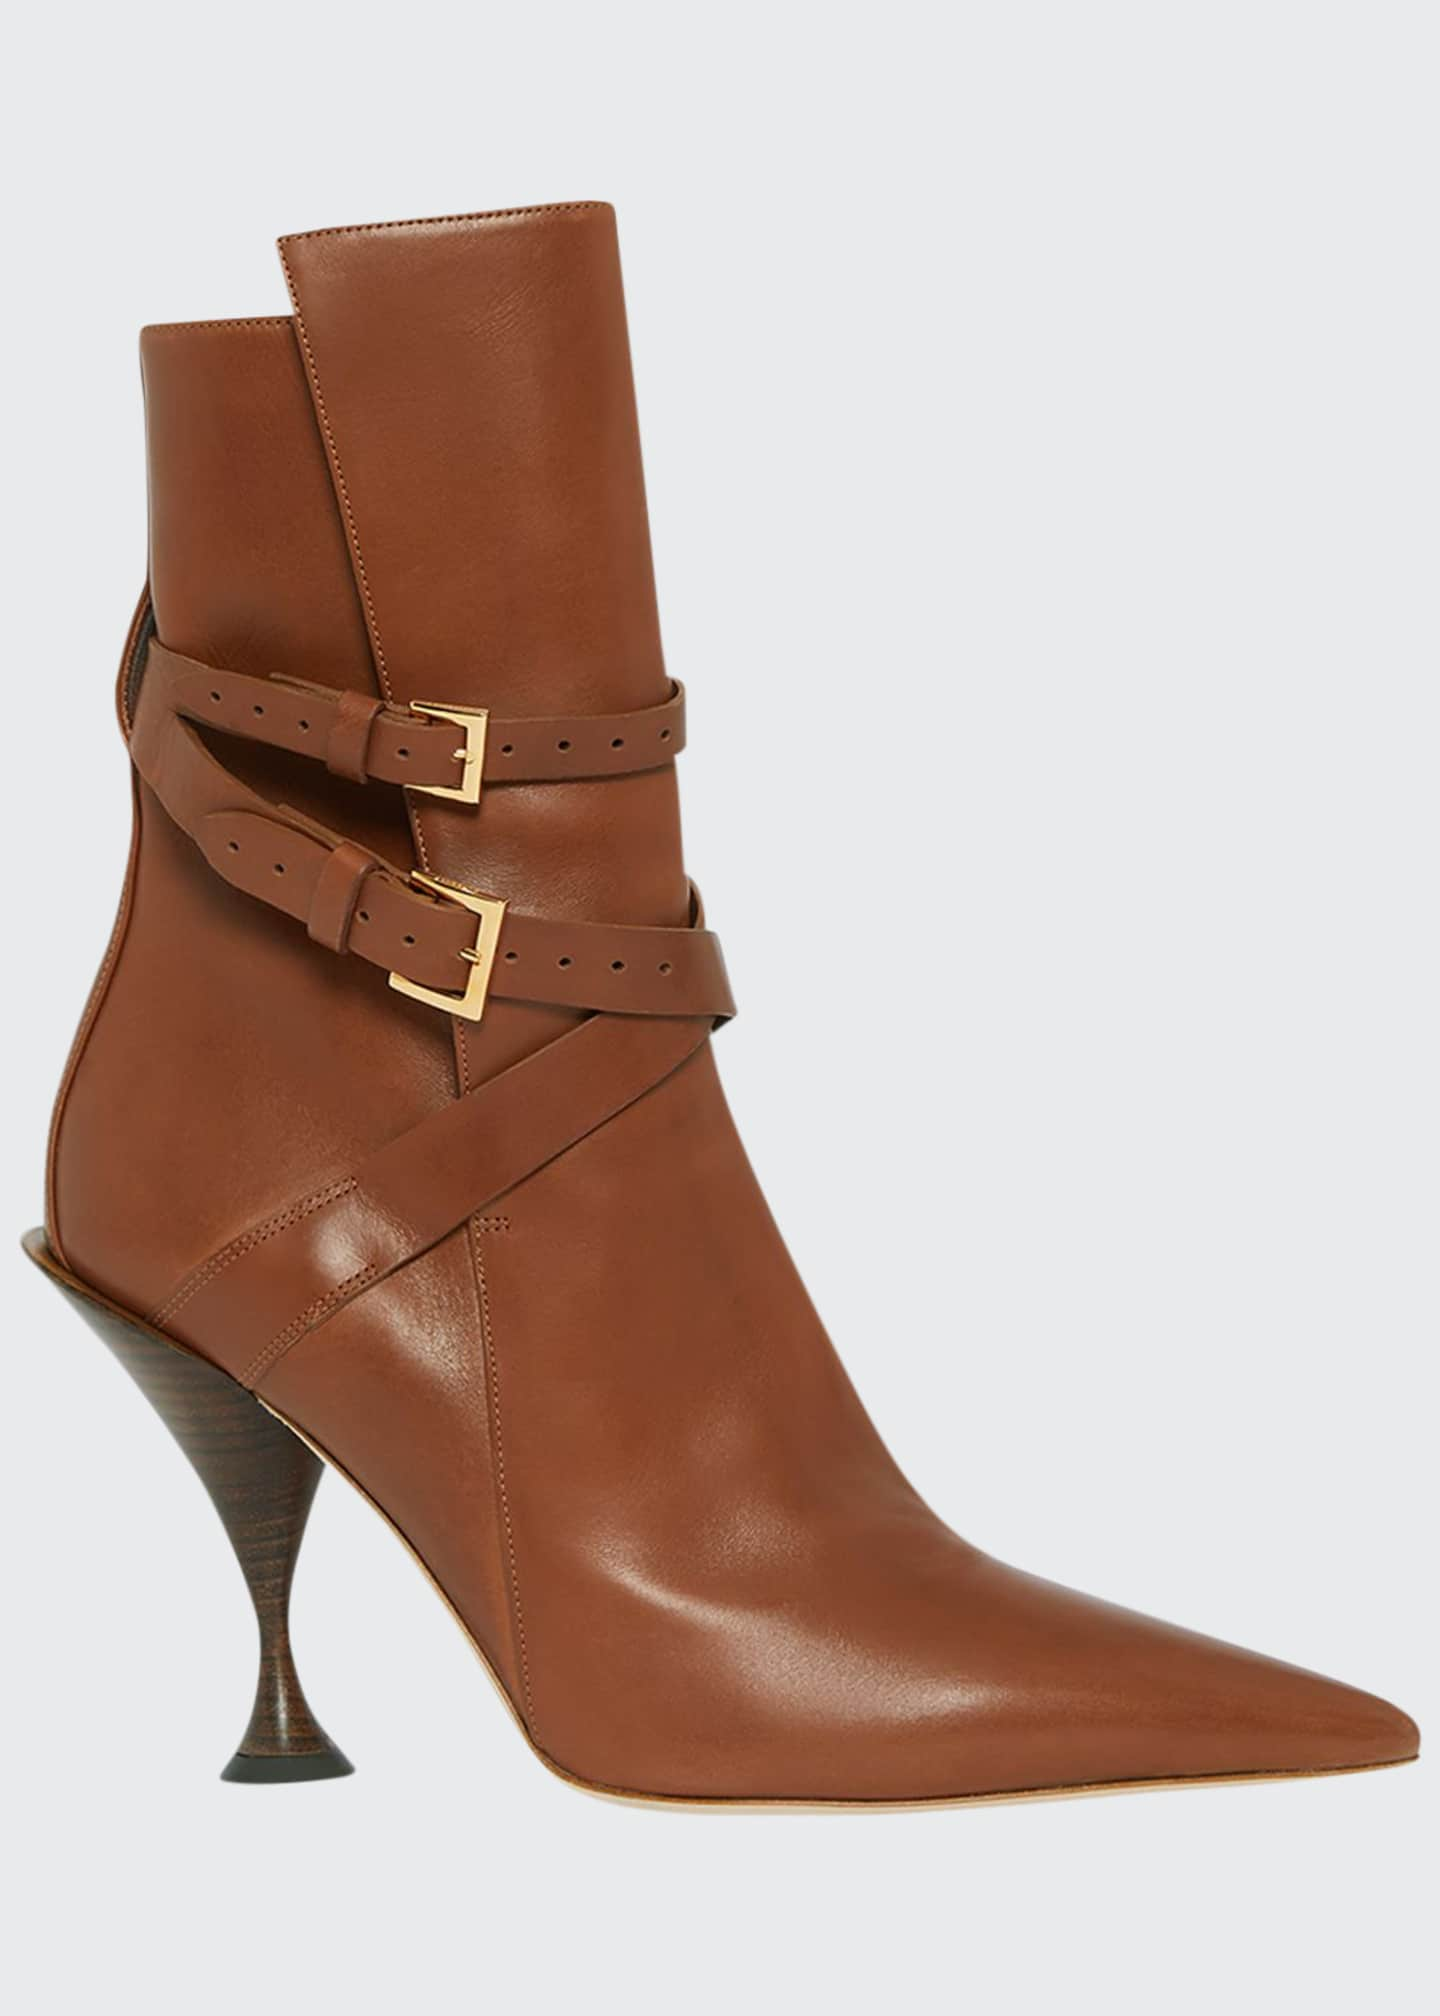 Burberry Hadfield Pedestal-Heel Leather Boots